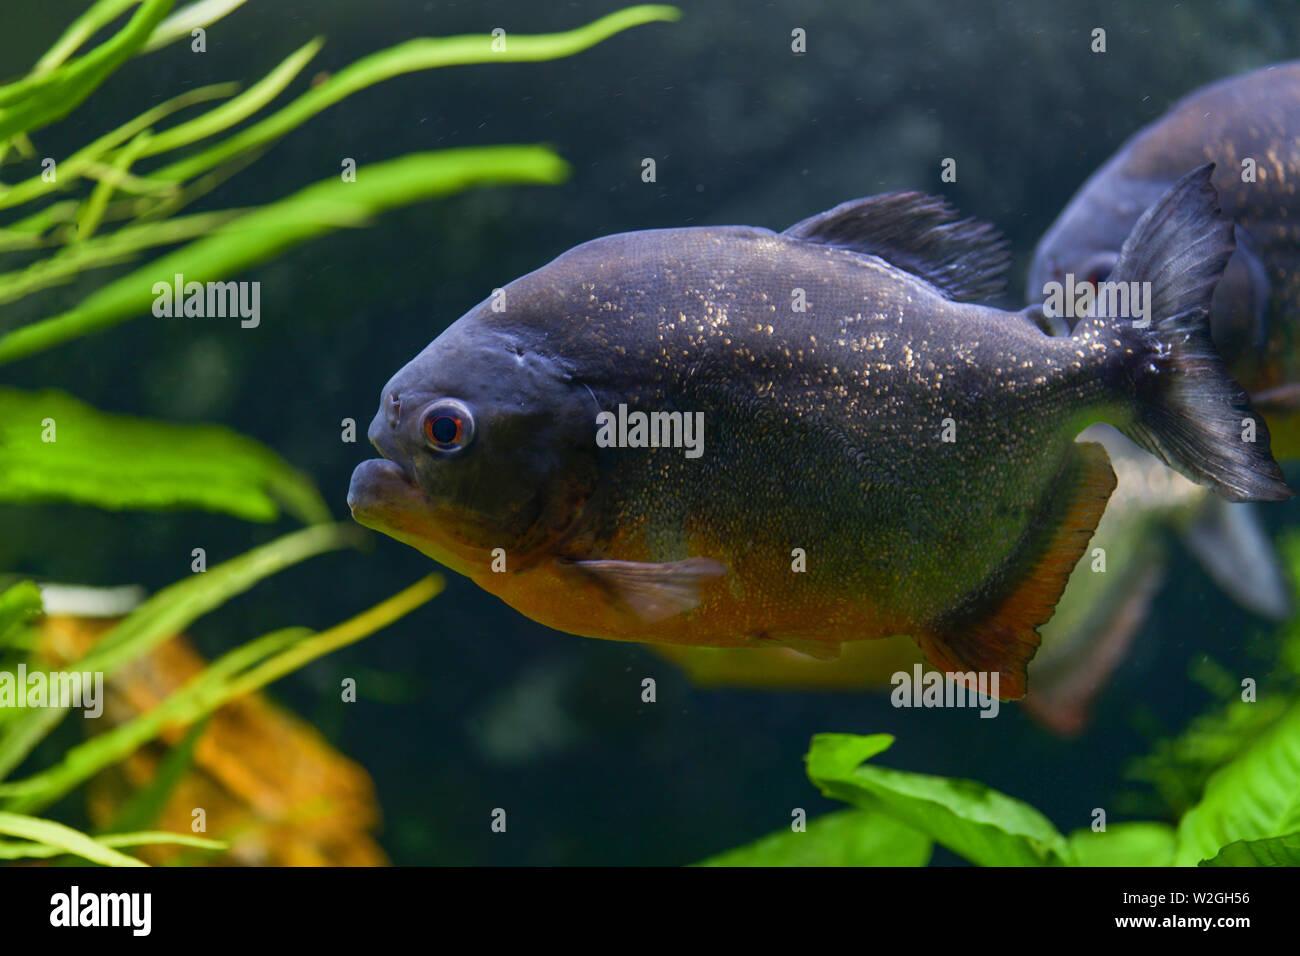 Predatory piranha fish swim in a transparent aquarium in a pet store. Horizontal photography - Stock Image